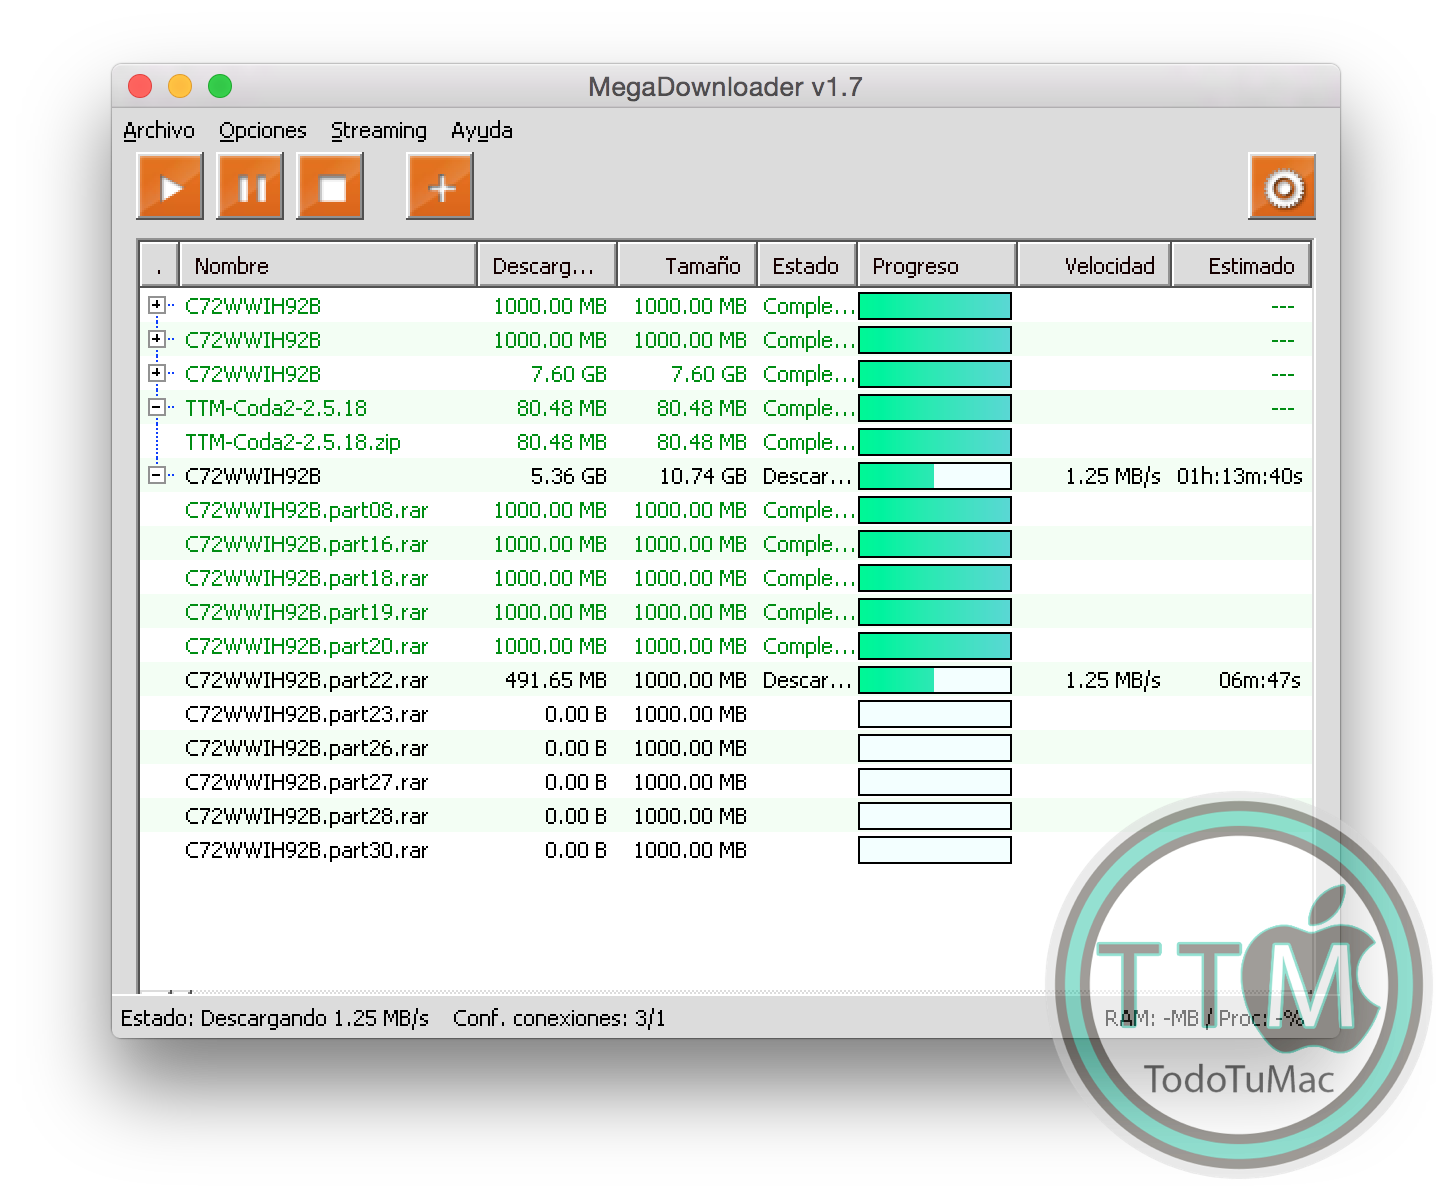 MegaDownloader v1.7 [wine] - TodoTuMac